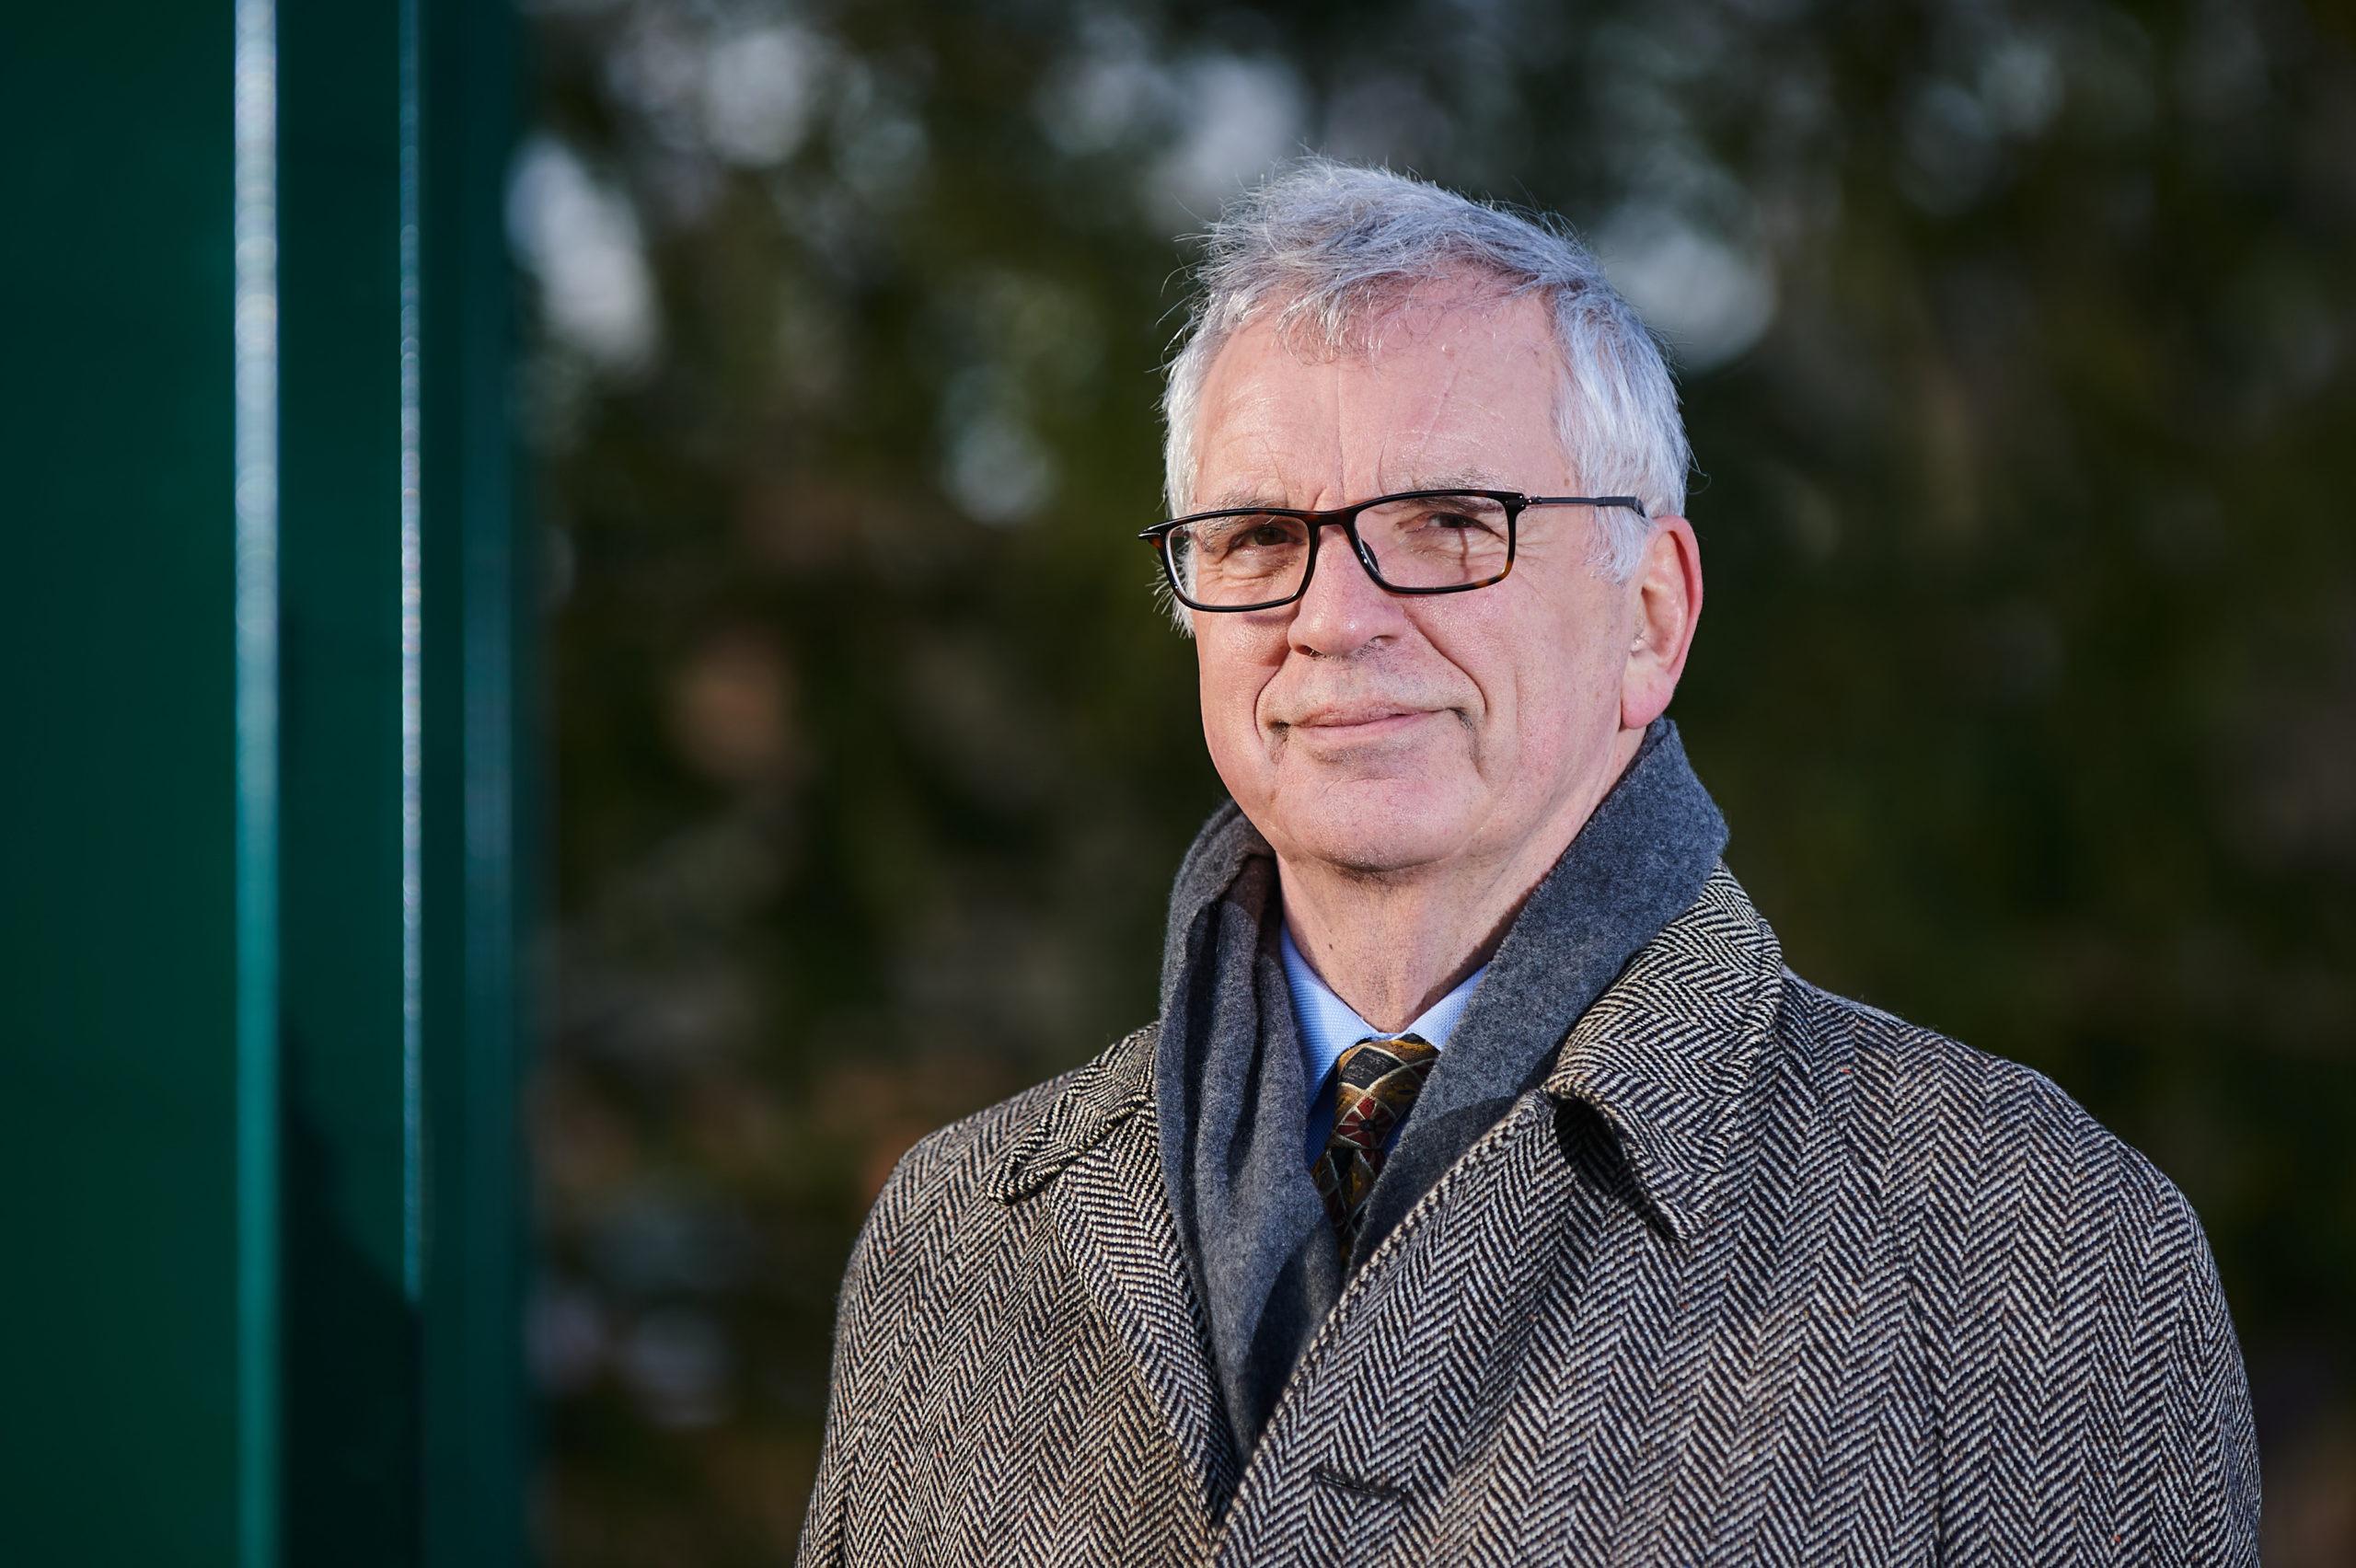 Chairman of The Gannochy Trust, David Gray.